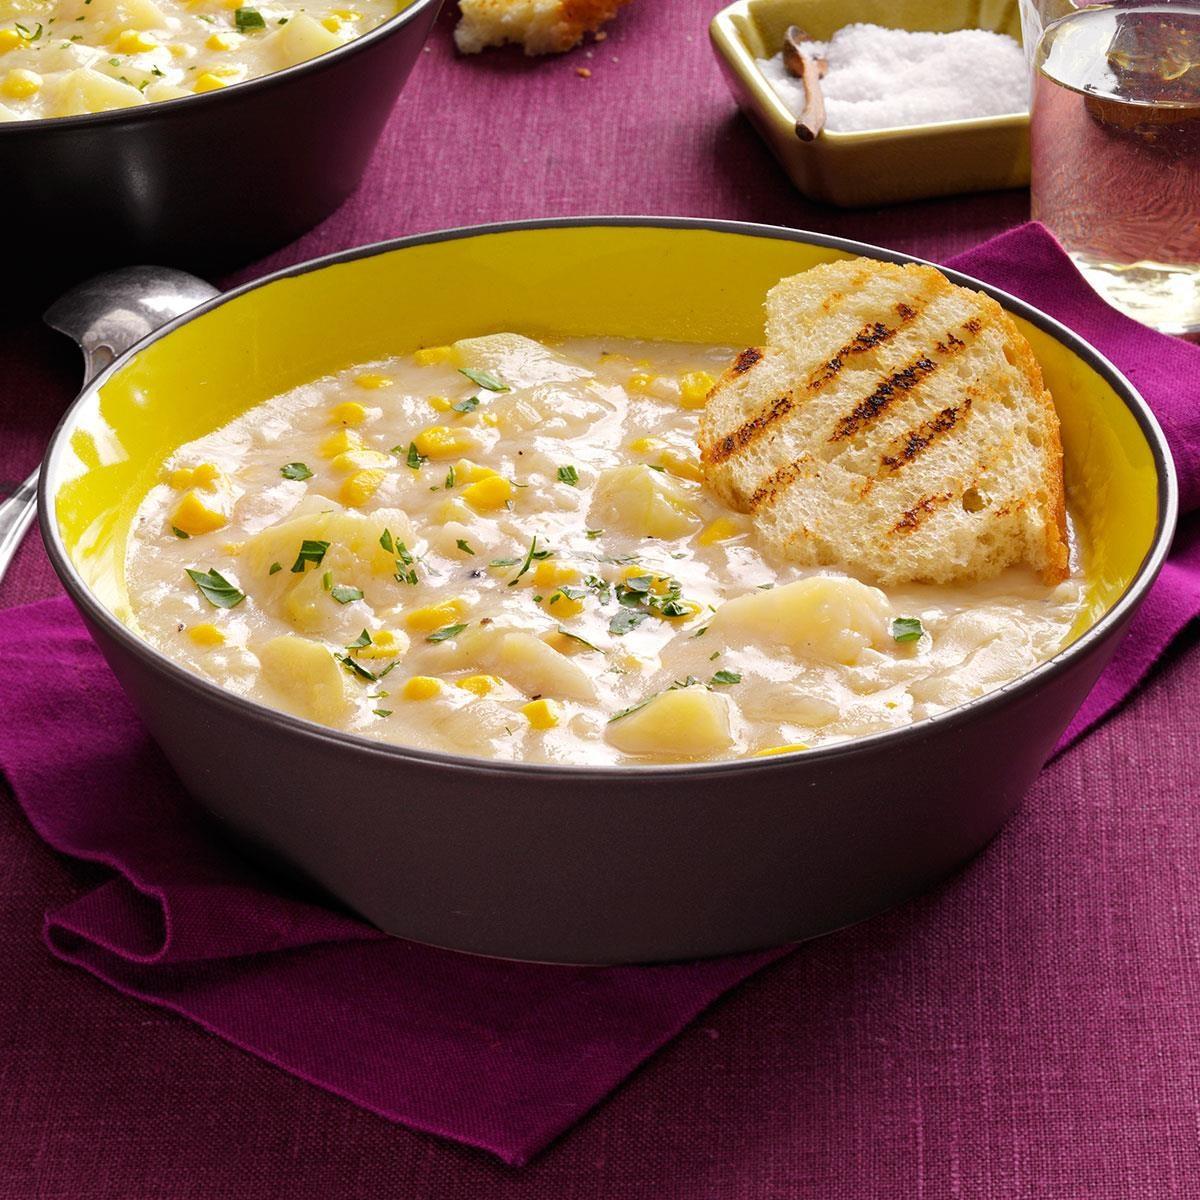 A bowl of Quick Potato Corn Chowder